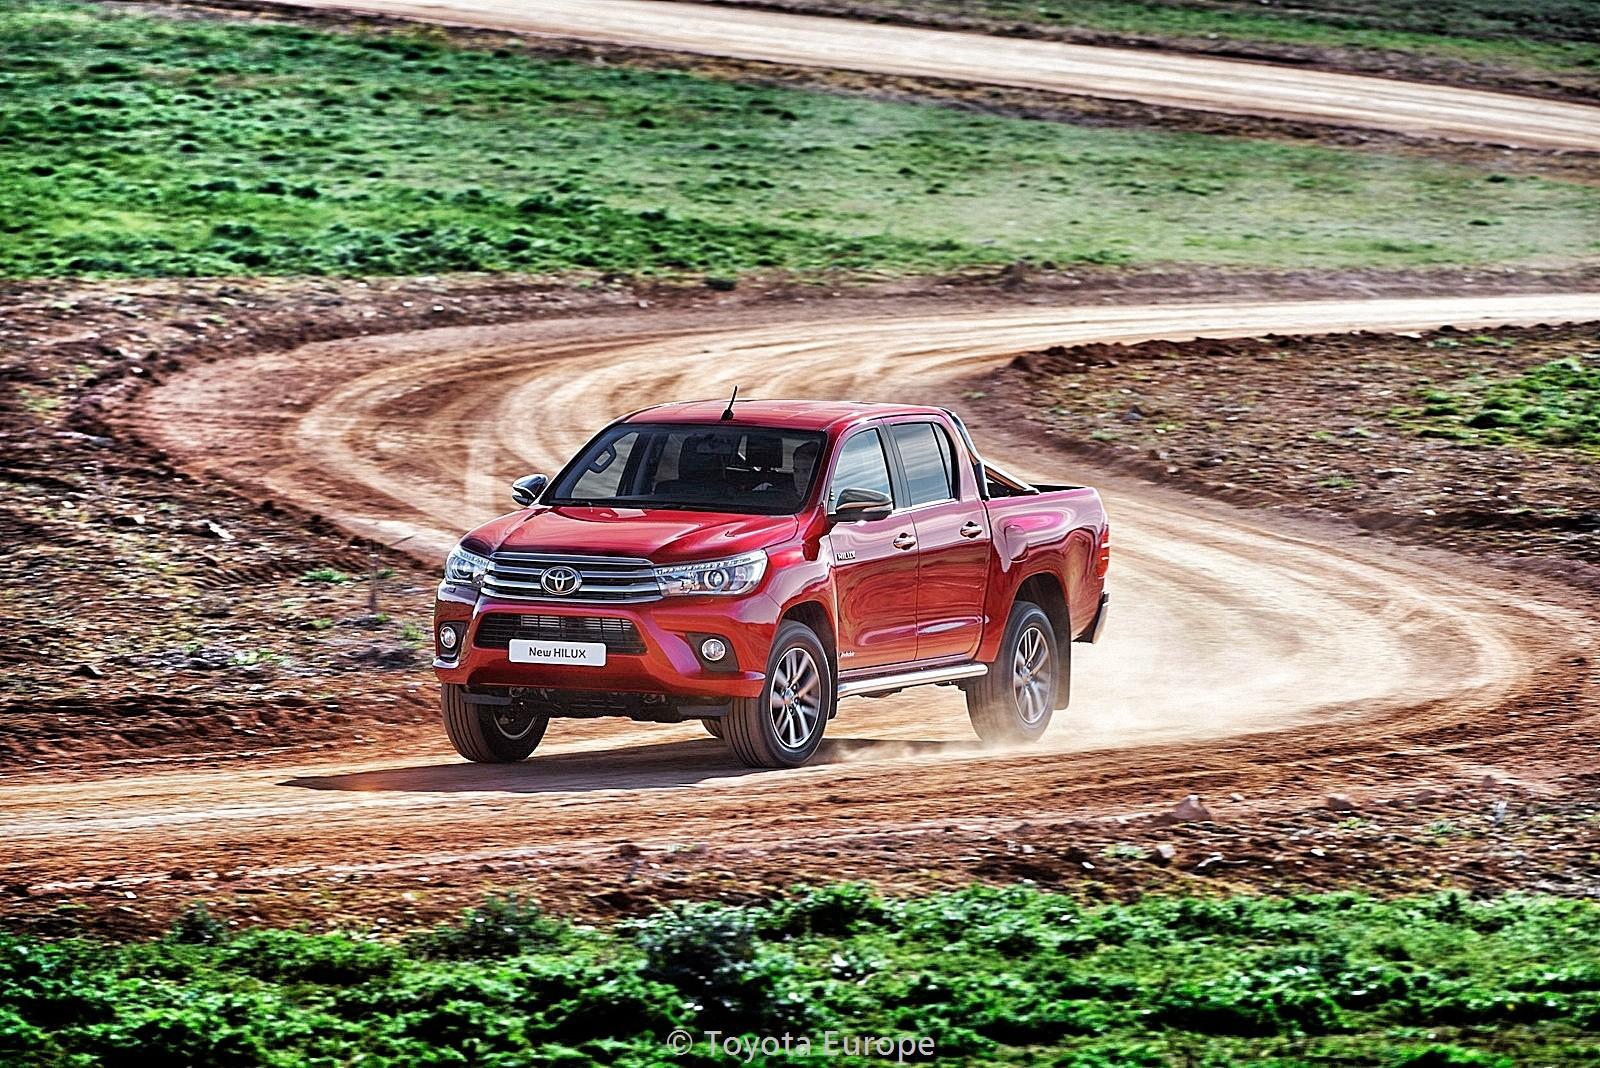 Toyota-Hilux-EU-spec-9_Snapseed